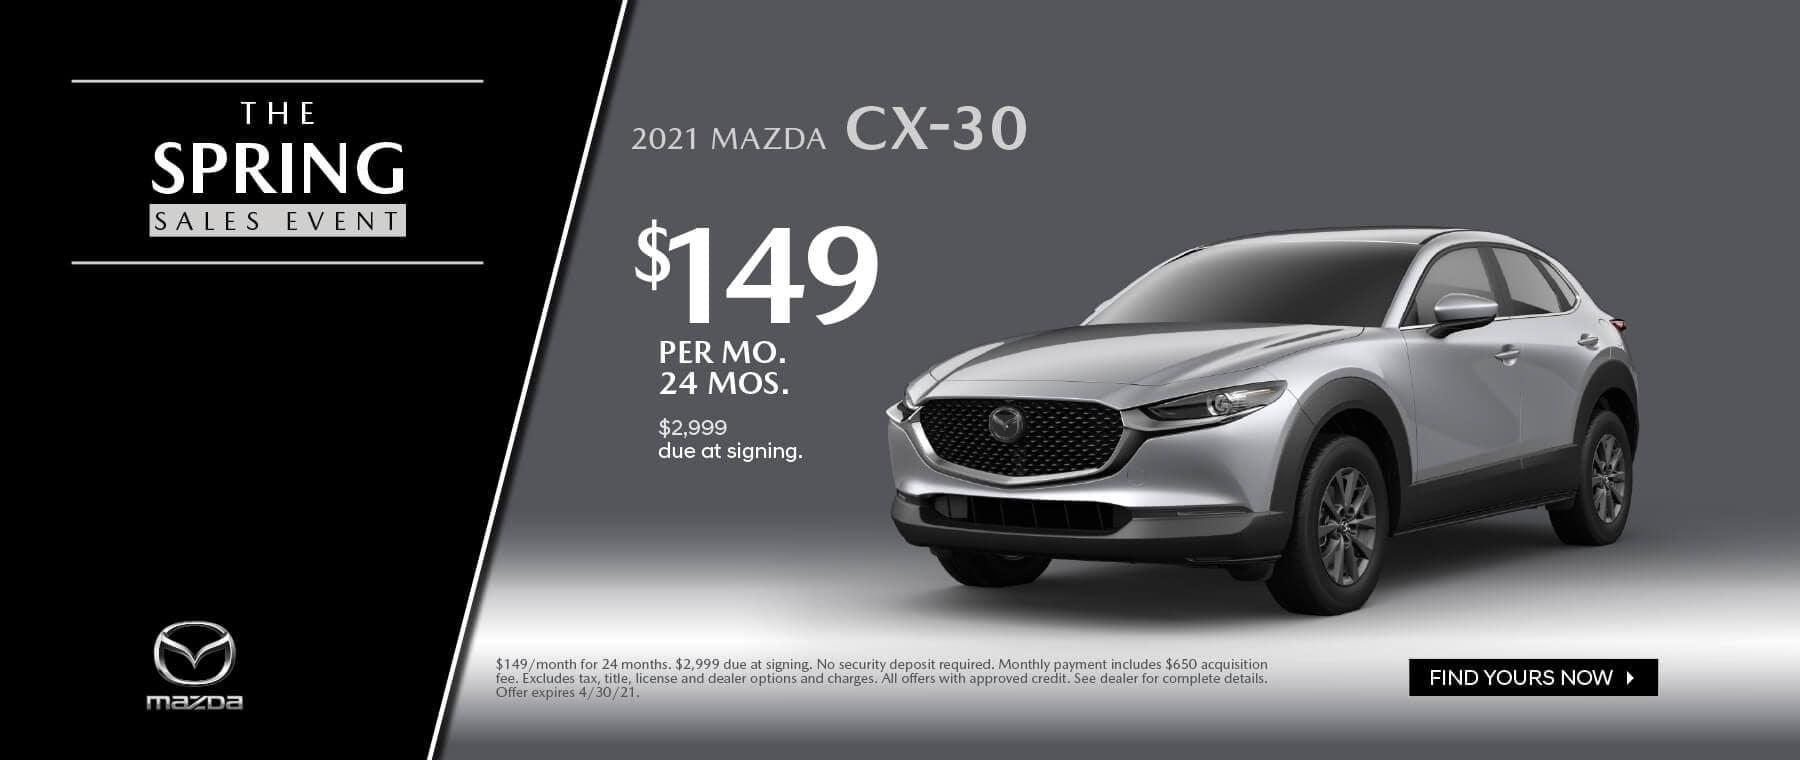 2021.03.26-Keffer-Mazda-APR-Web-Banners-S51614vw-6